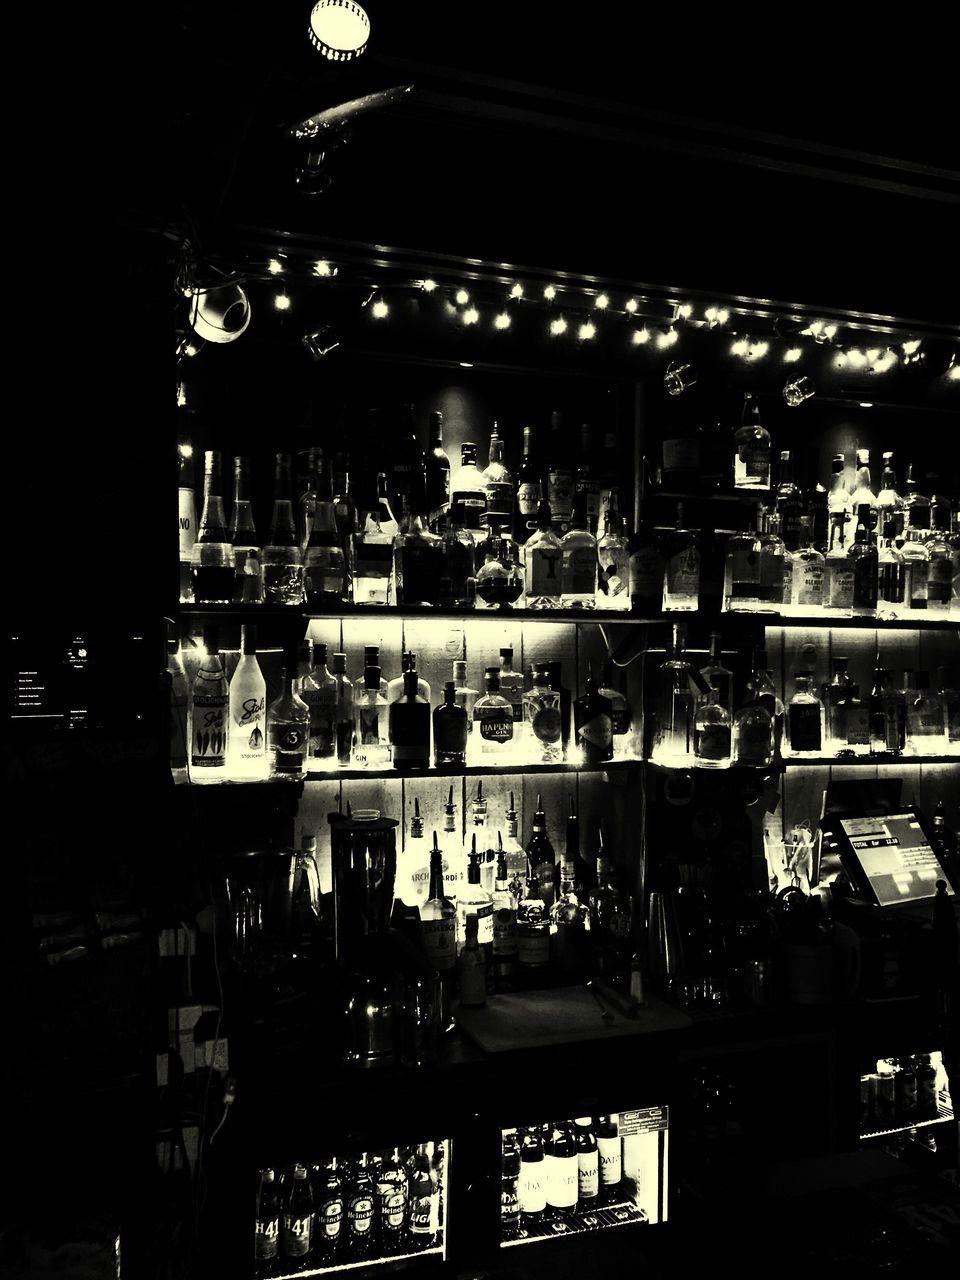 night, illuminated, indoors, store, shelf, bottle, retail, bar - drink establishment, no people, nightlife, alcohol, nightclub